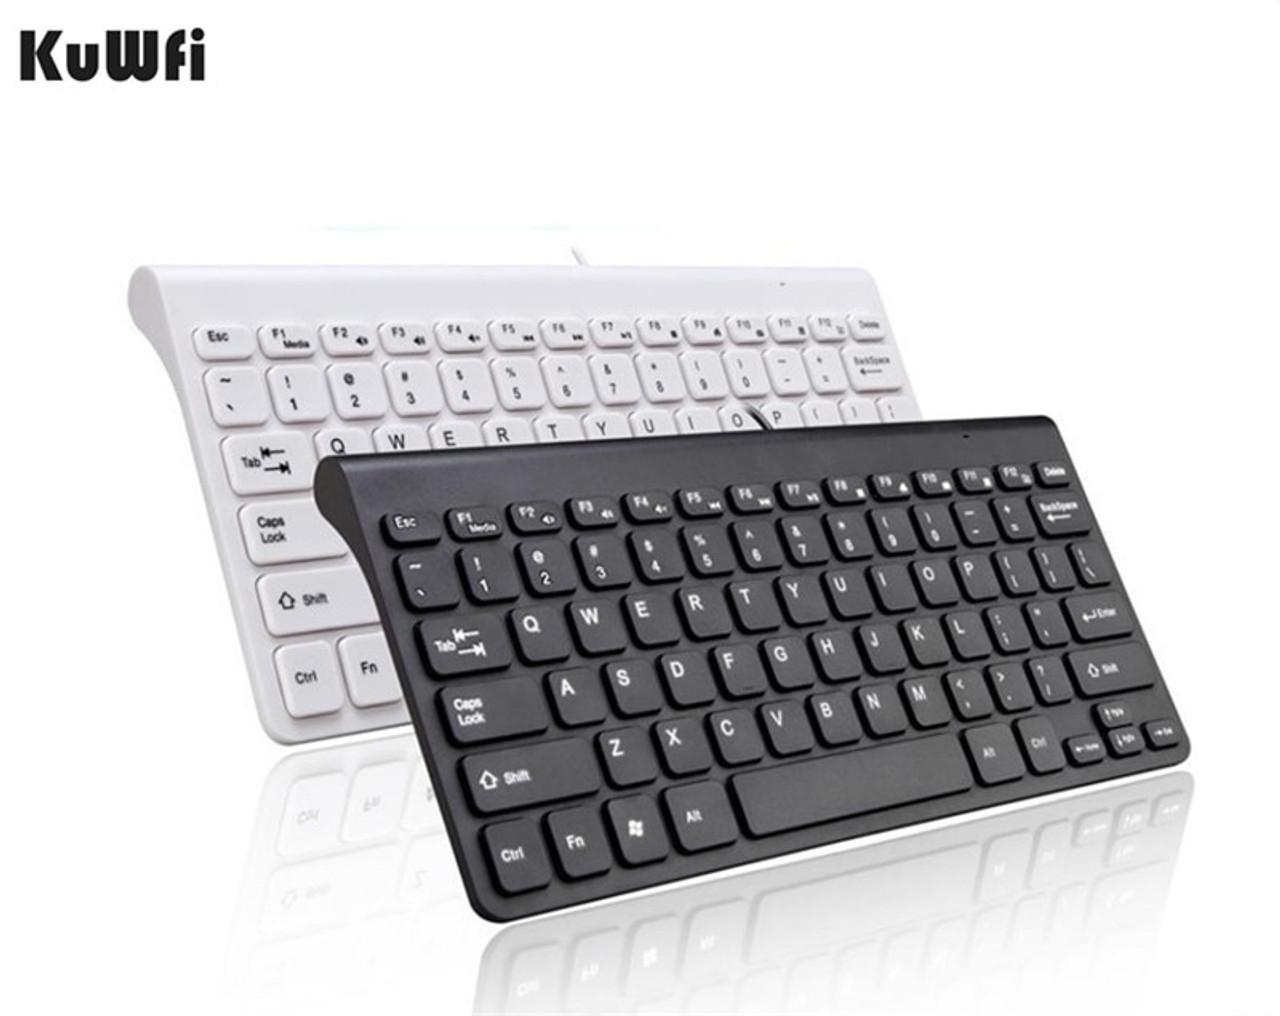 8d4da8488a8 ... KuWFi New Keyboard Ultra thin Quiet Small Size 78 Keys Mini Multimedia USB  Keyboard For Laptop ...